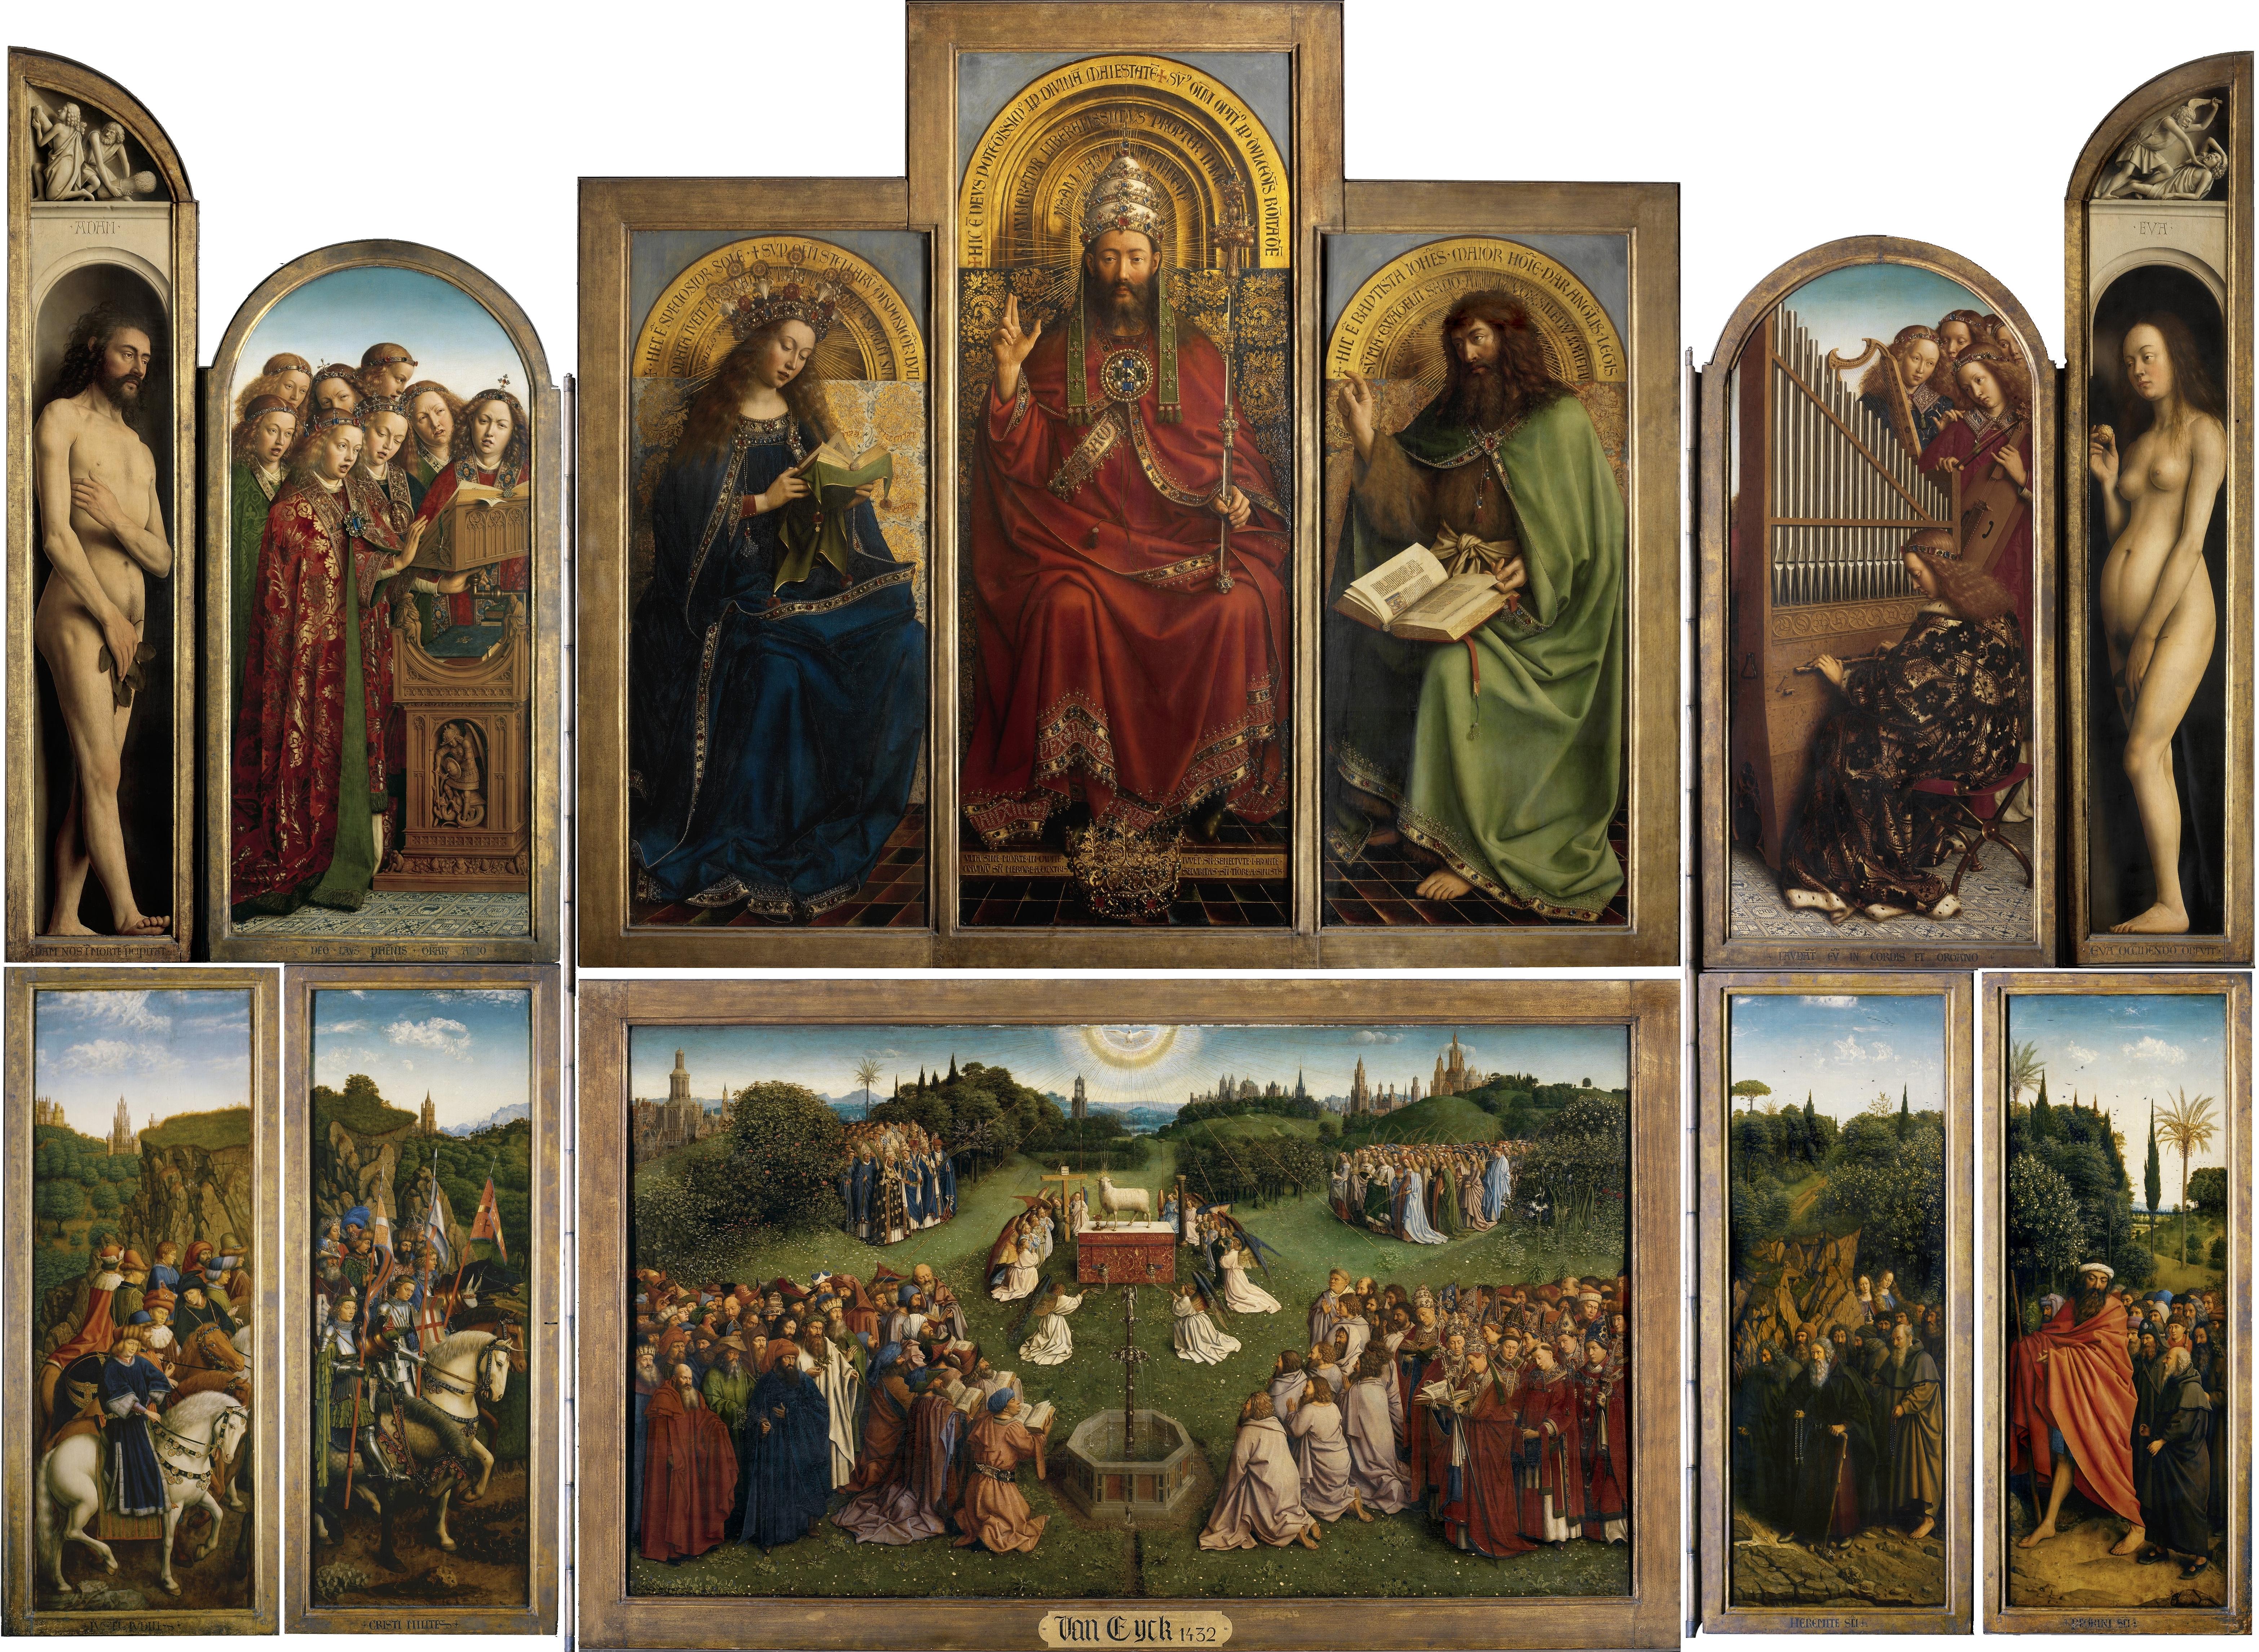 Ghent Altarpiece Lamb religious art | Daydre...